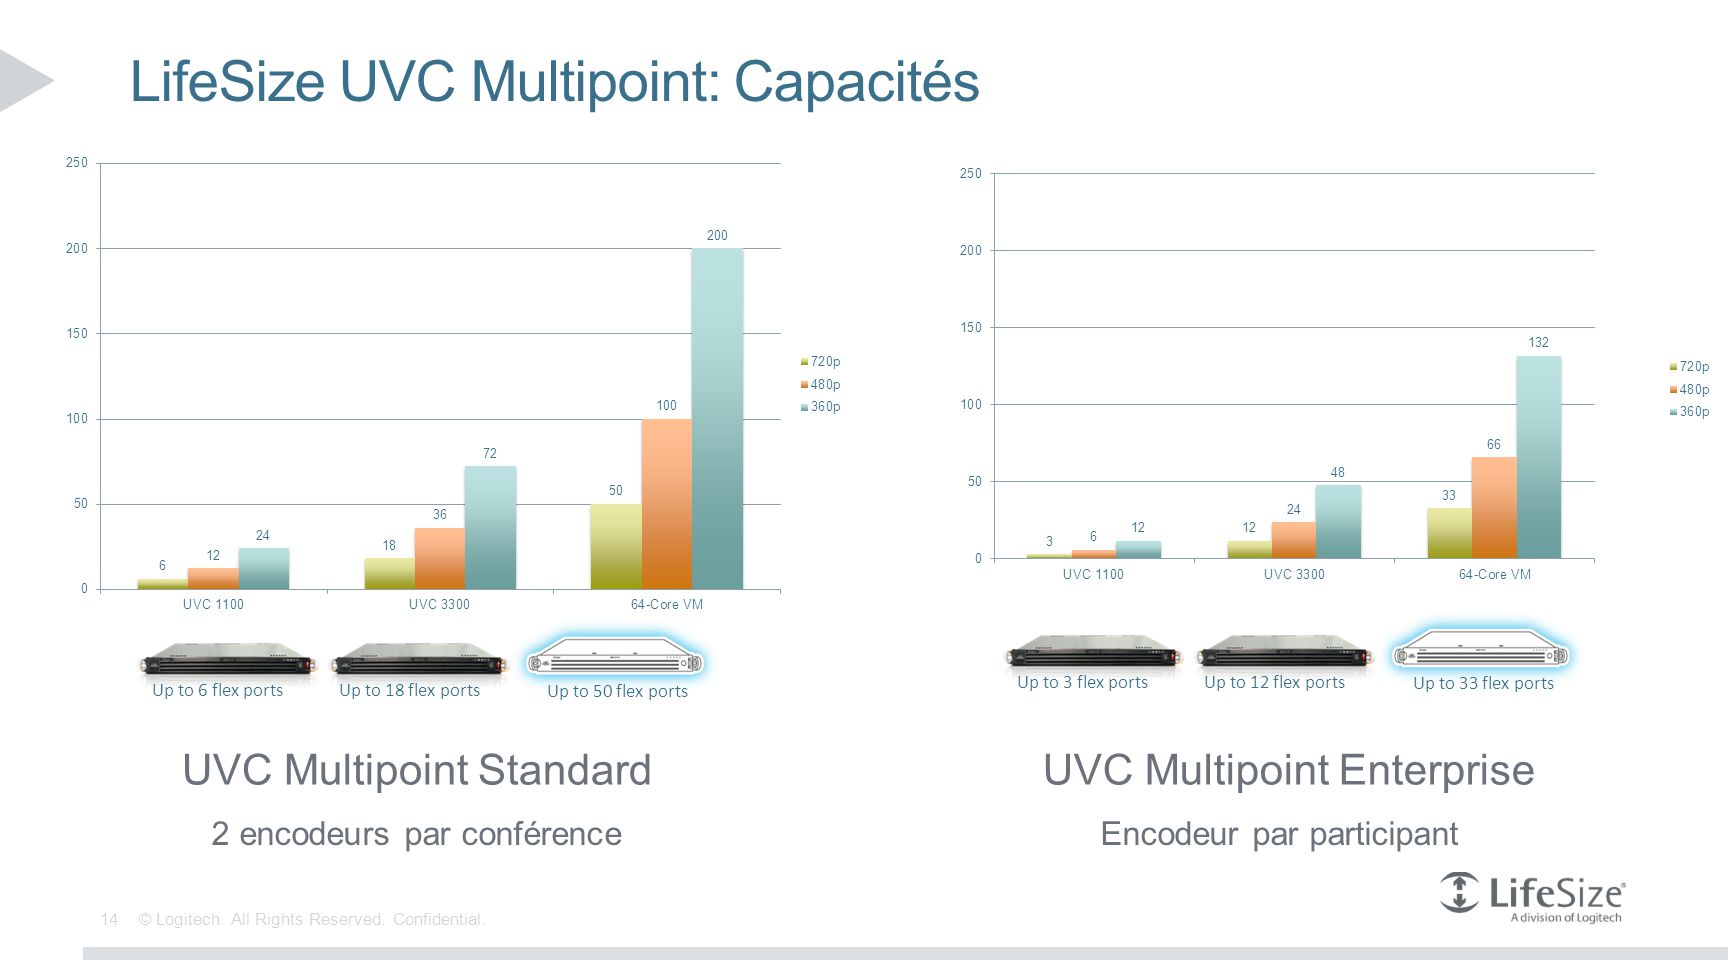 LifeSize UVC Multipoint: Capacités